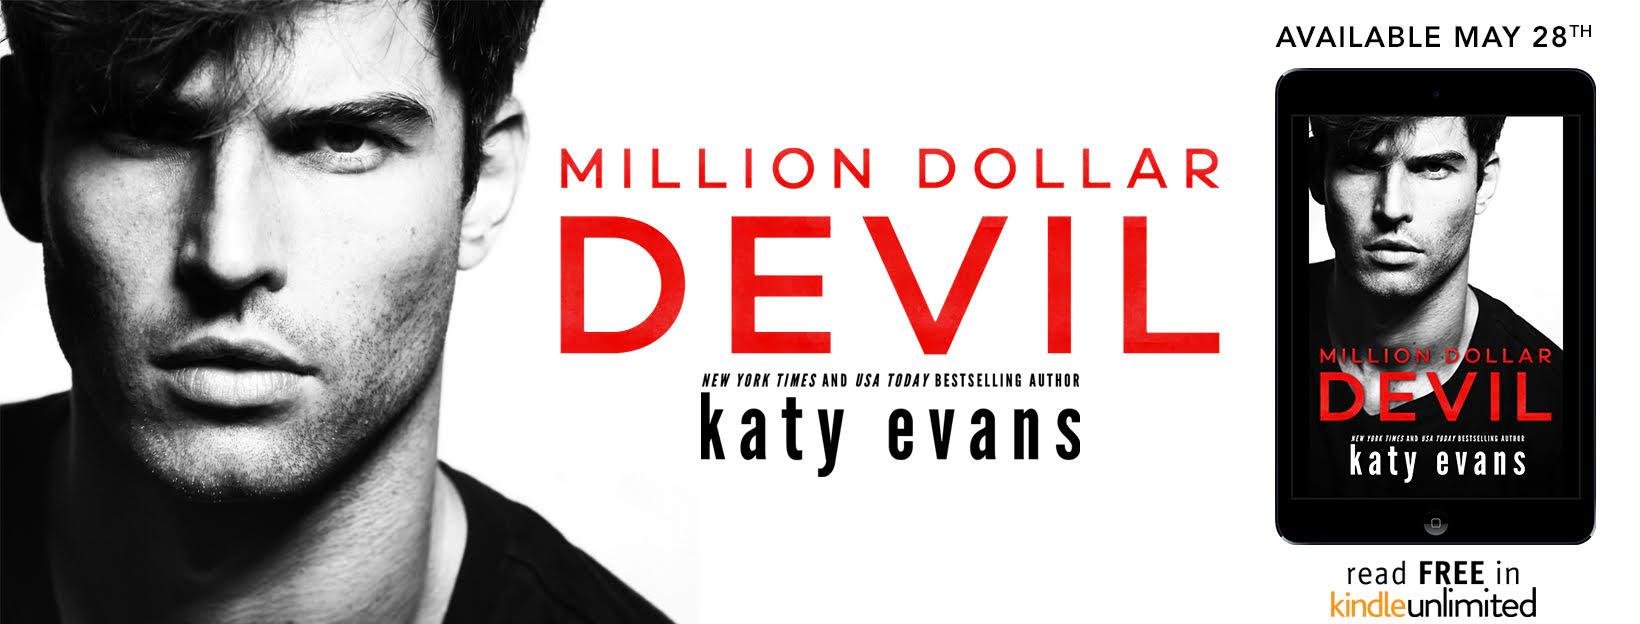 Million Dollar Devil by Katy Evans Release